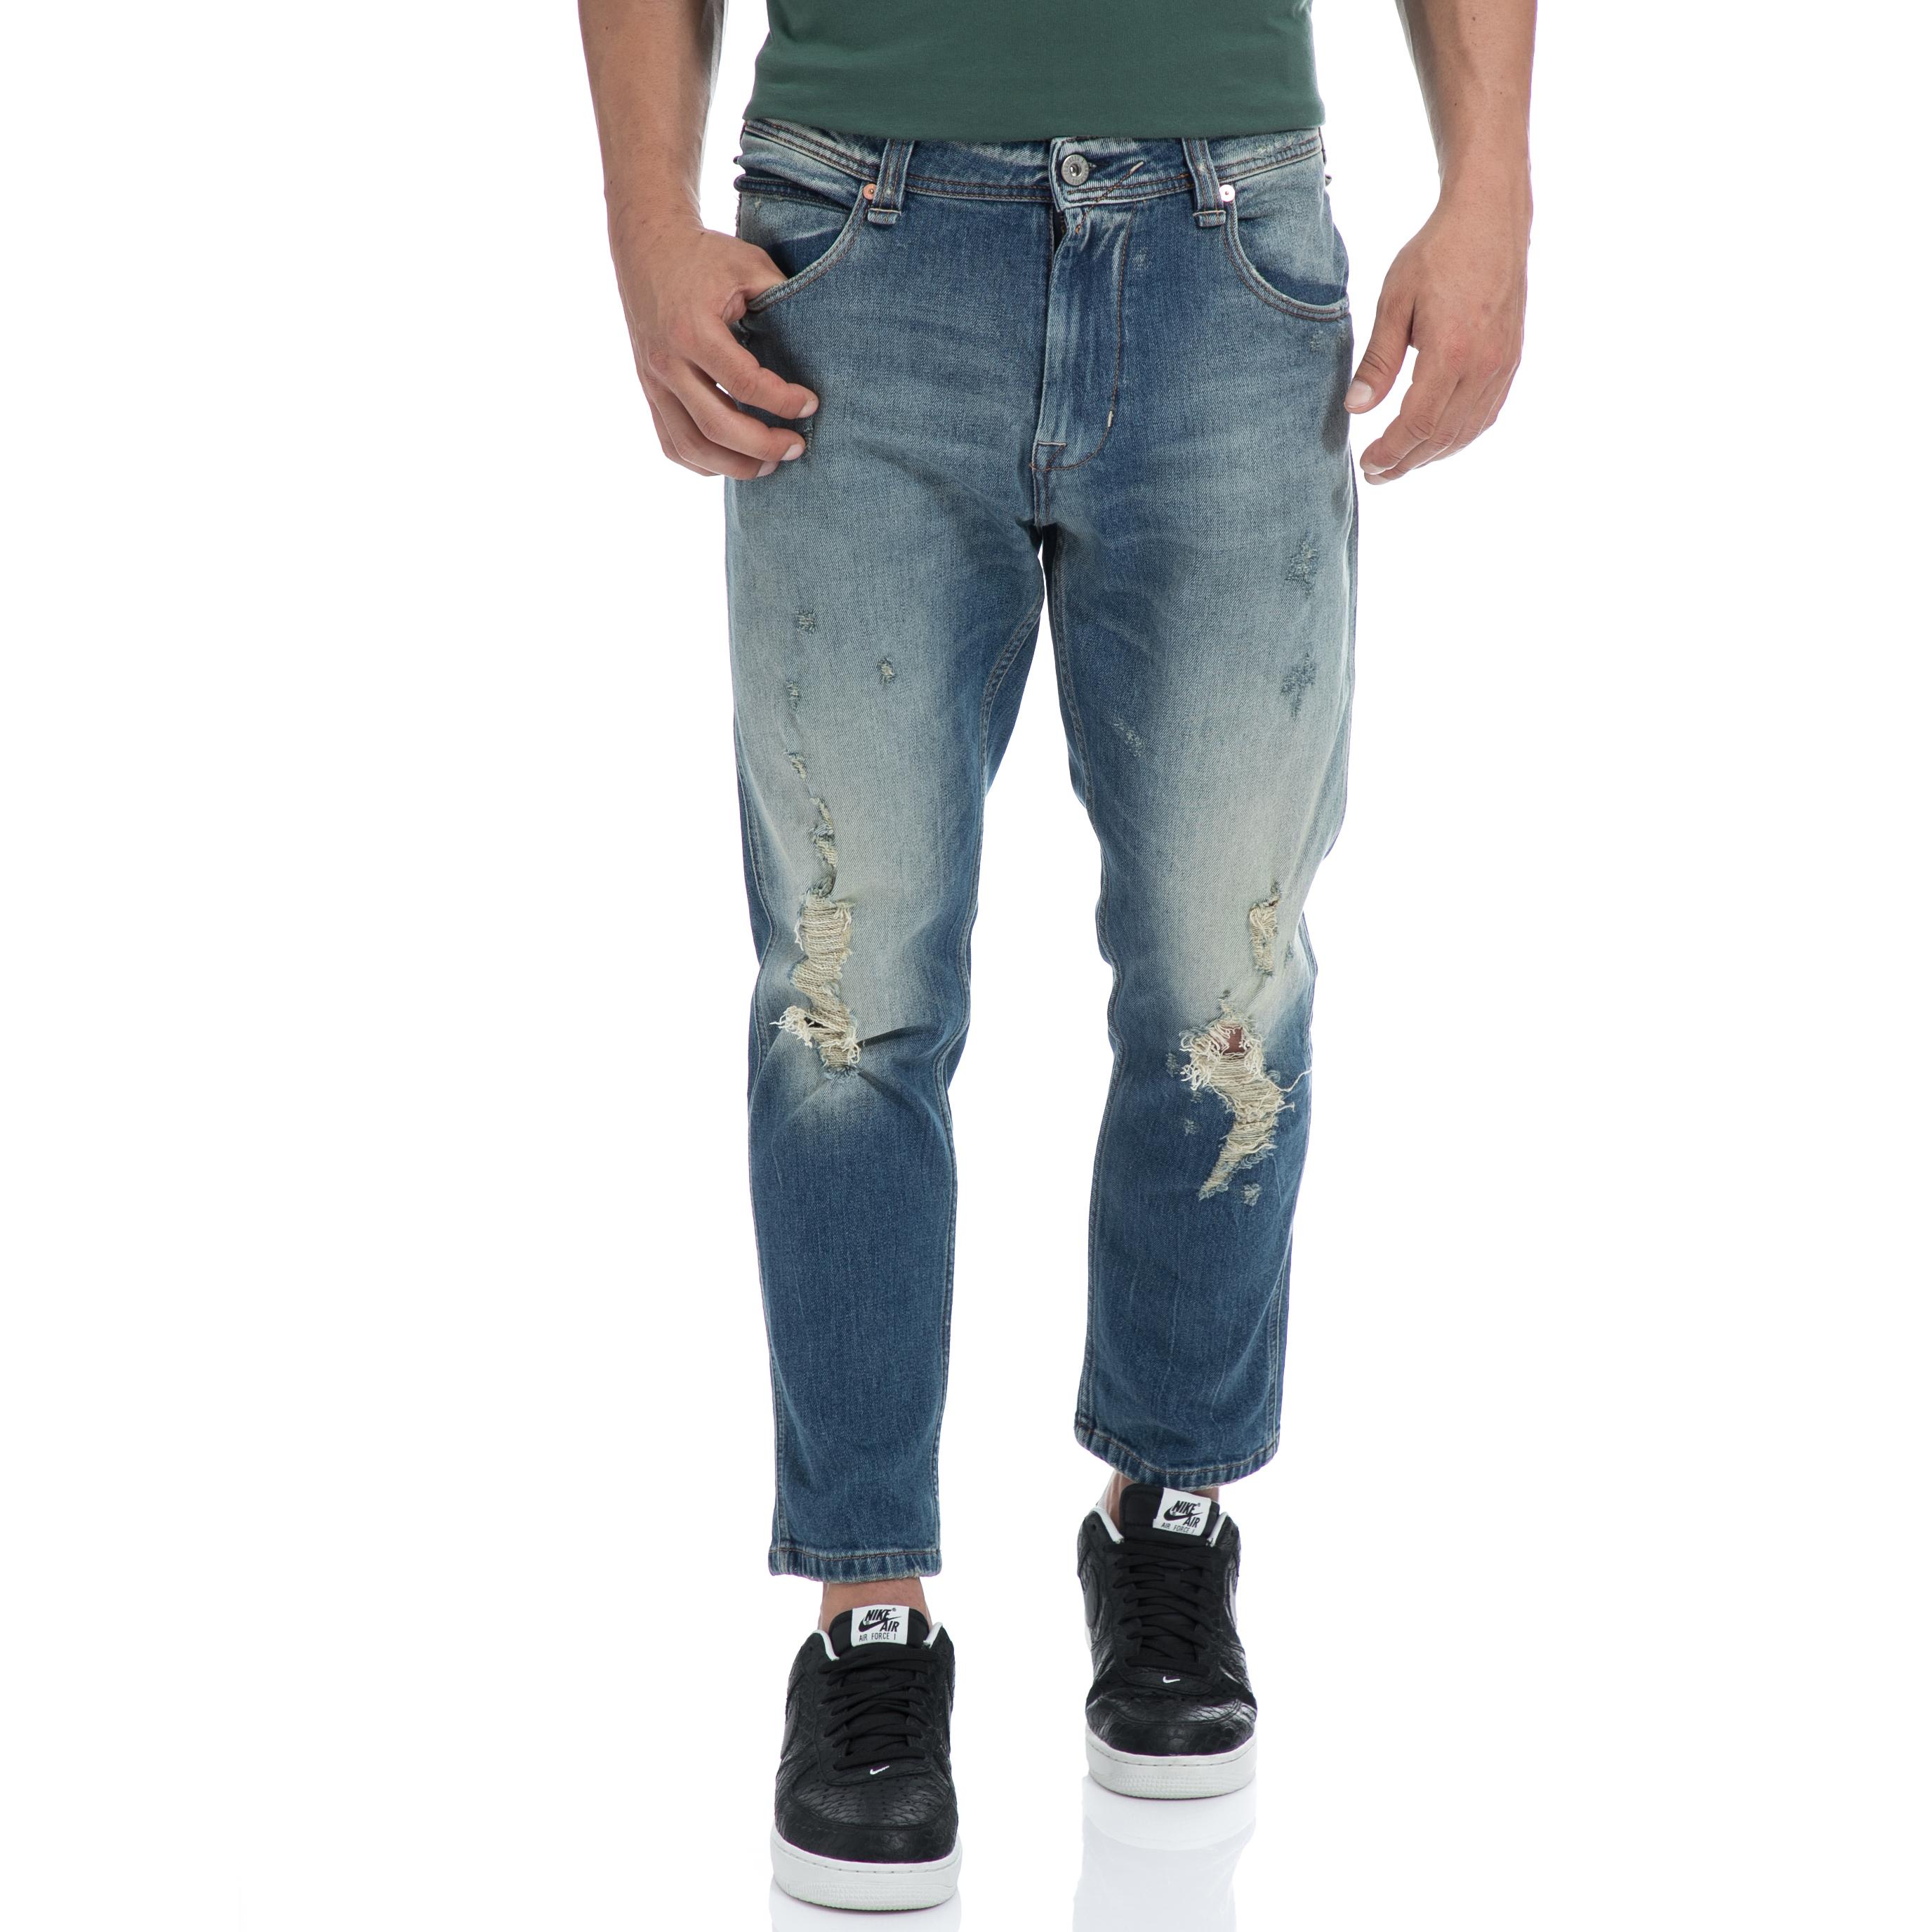 FRANKLIN & MARSHALL – Αντρικό τζιν παντελόνι FRANKLIN & MARSHALL μπλε